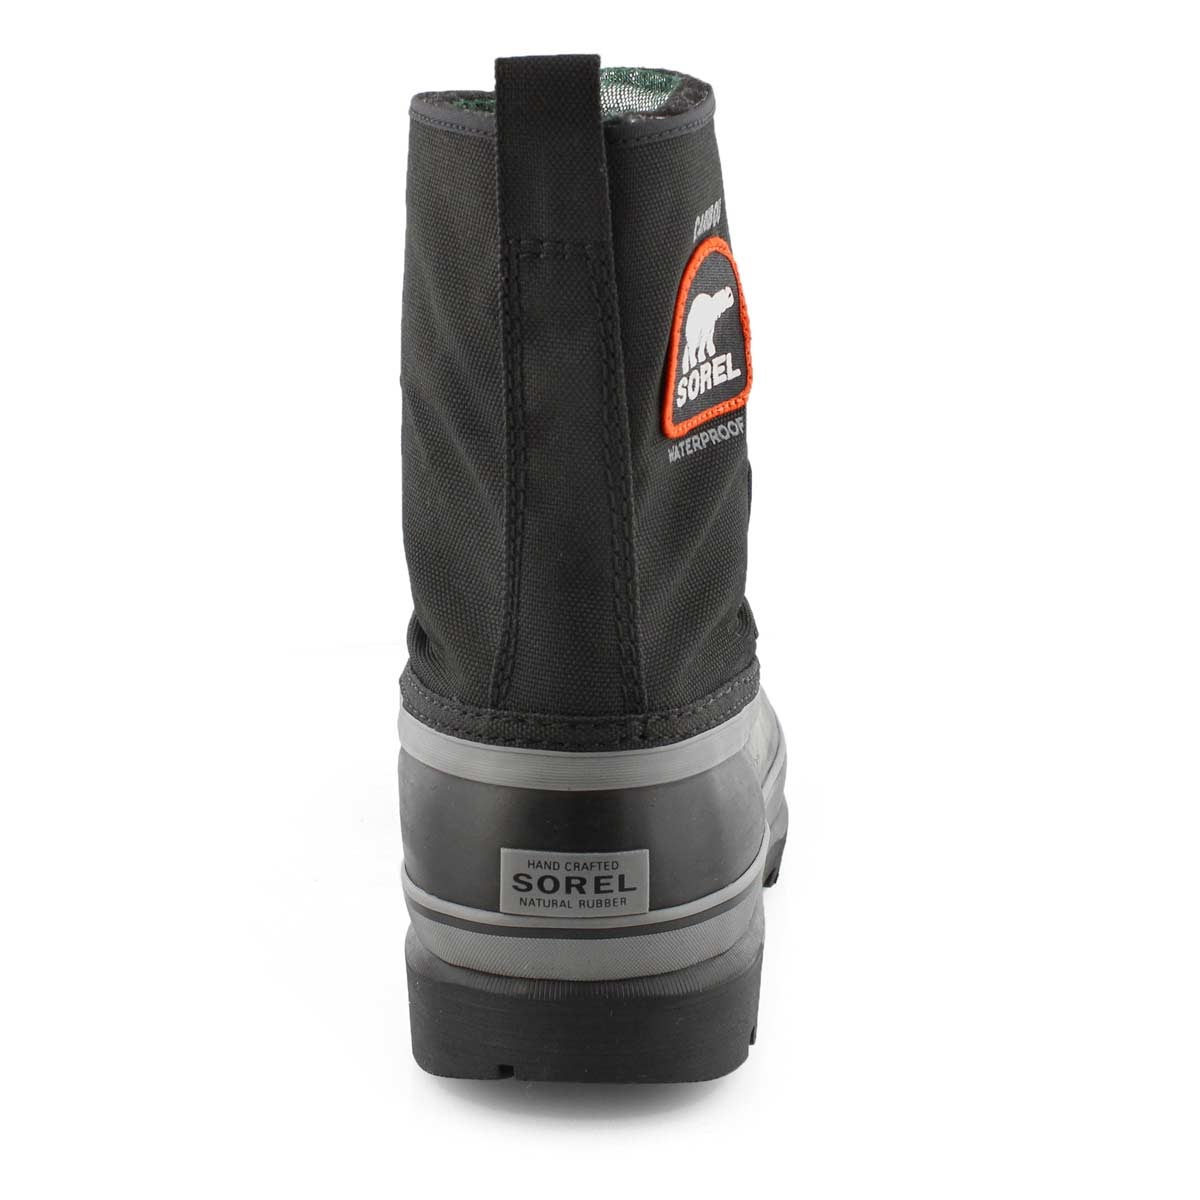 Mns Caribou XT black wtpf winter boot